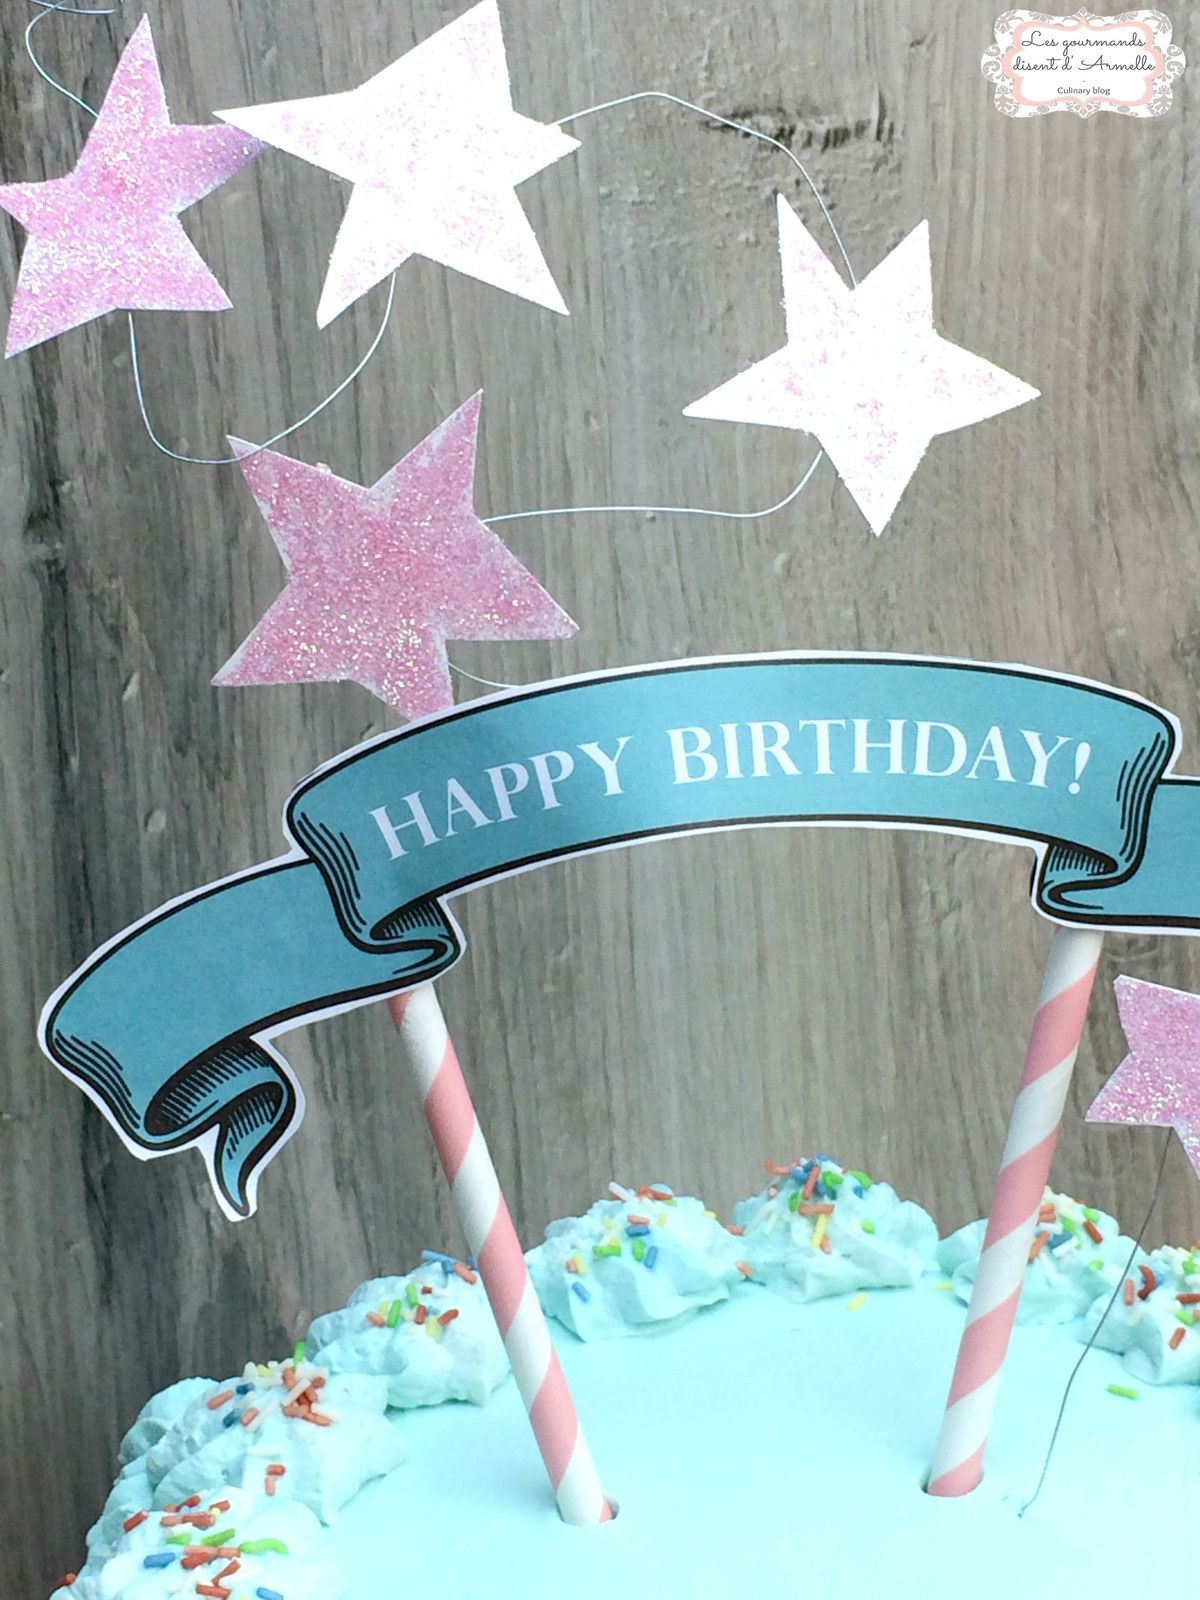 Confetti cake (birthday cake - gâteau d'anniversaire)